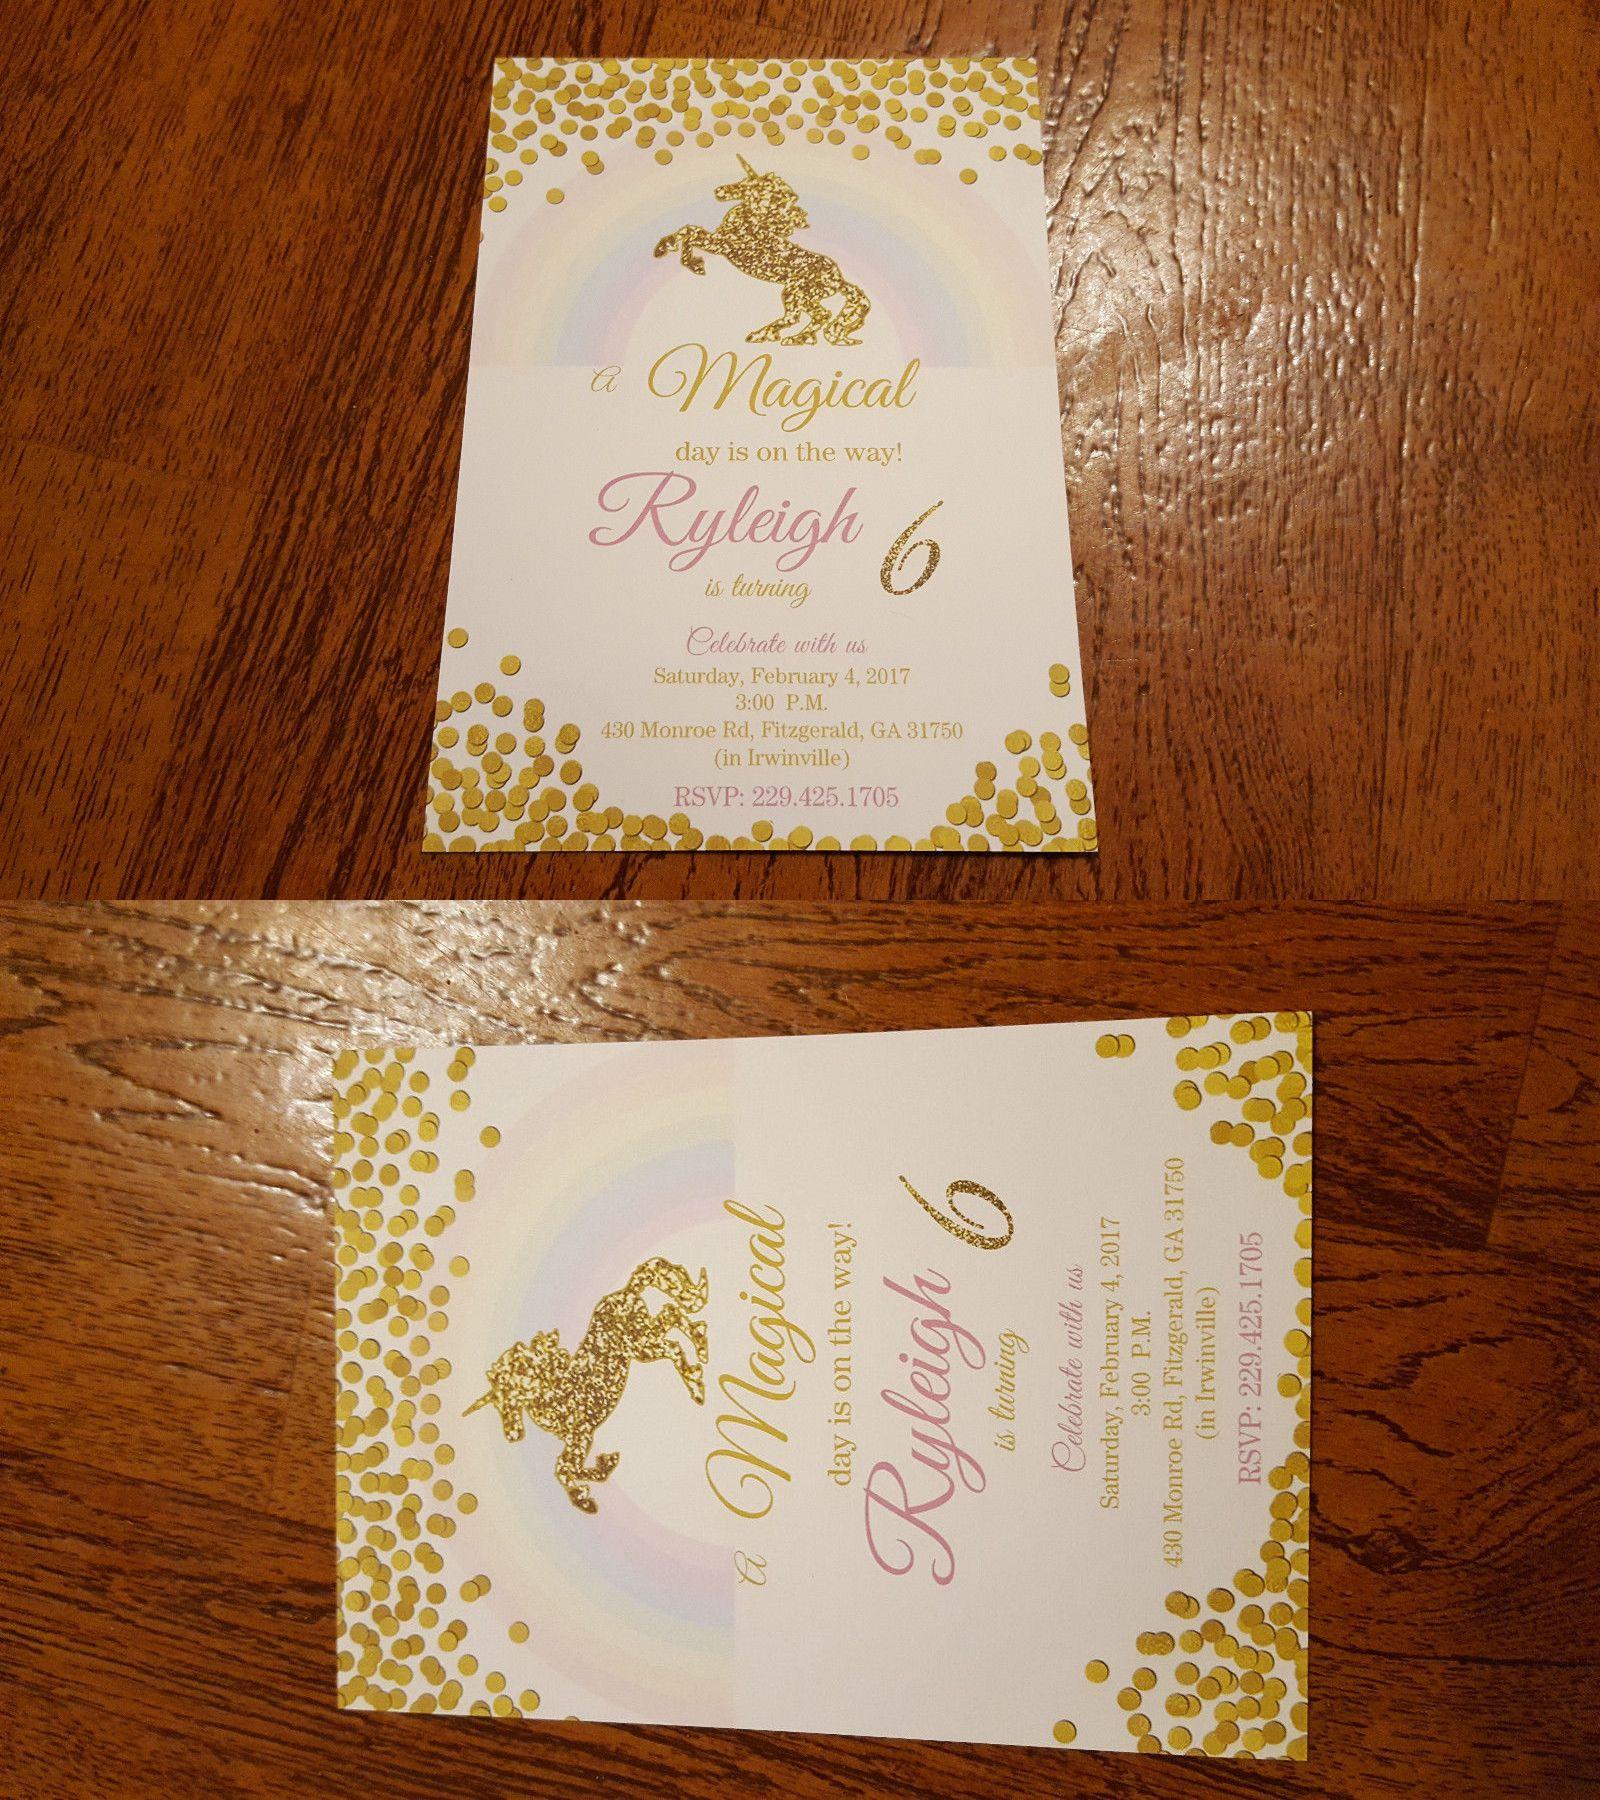 Greeting Cards and Invitations 170098 Unicorn Birthday – Buy Birthday Invitations